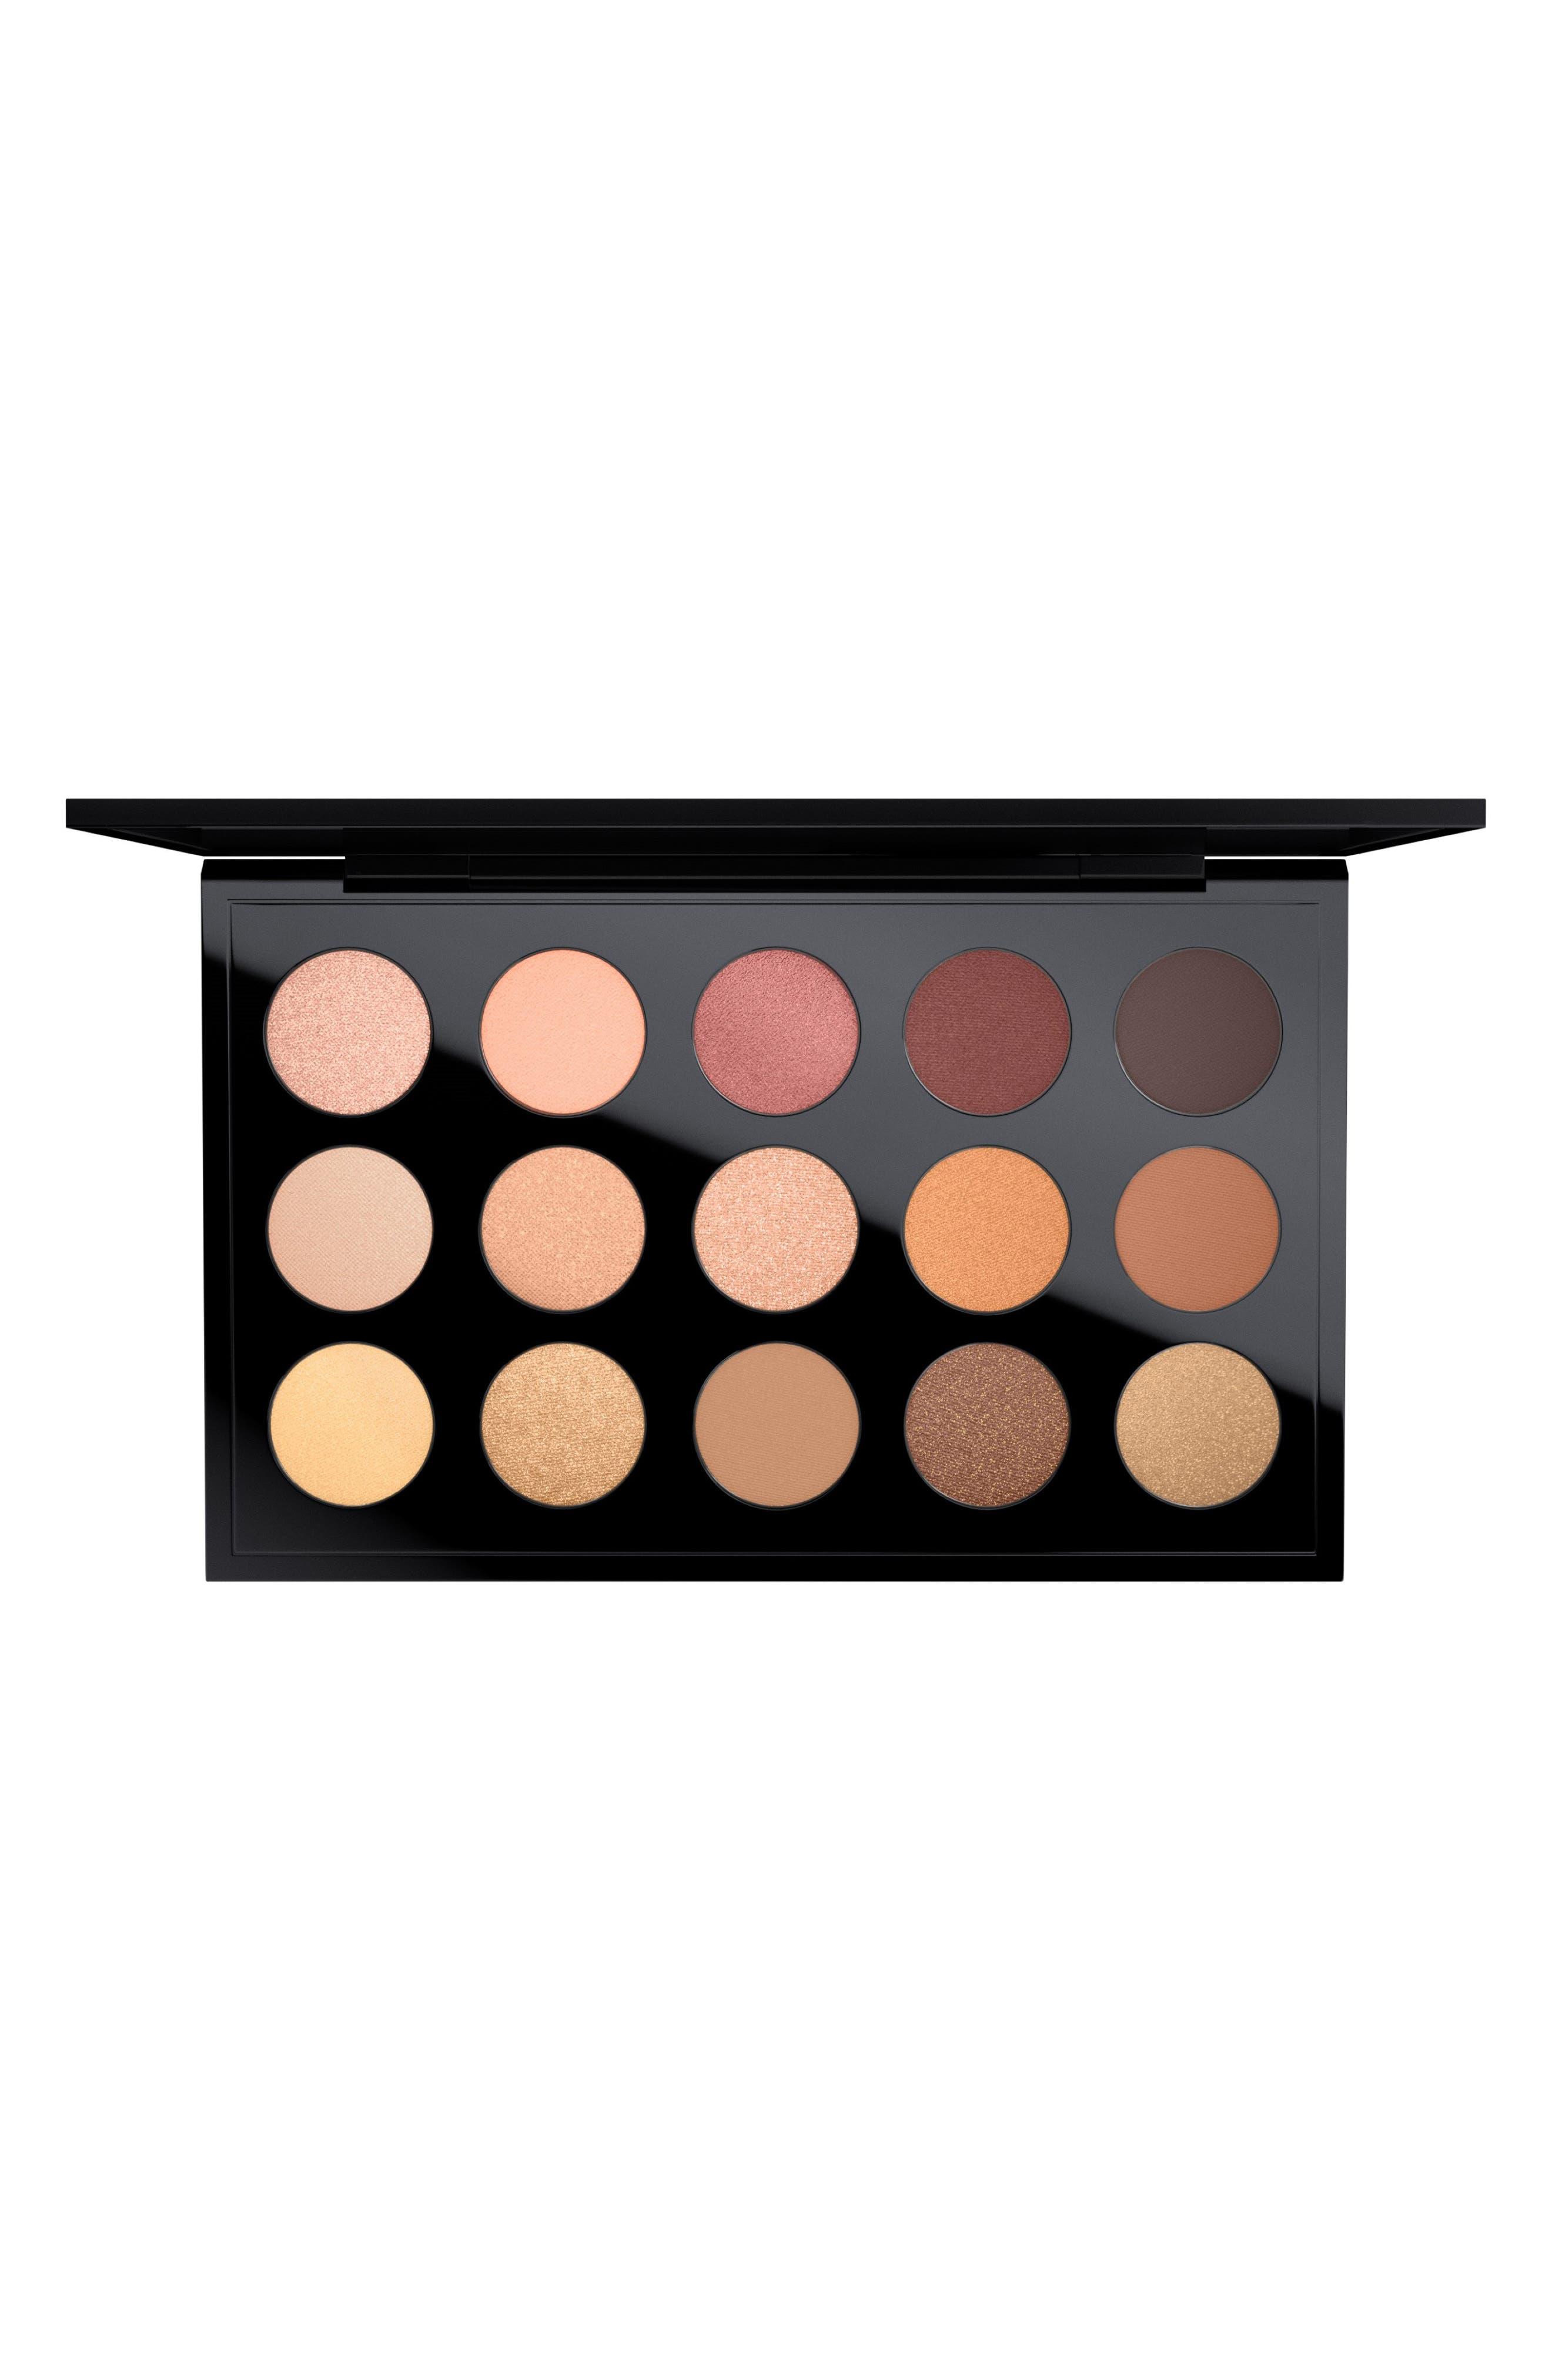 MAC Cool Neutral Times 15 Eyeshadow Palette,                             Main thumbnail 1, color,                             200